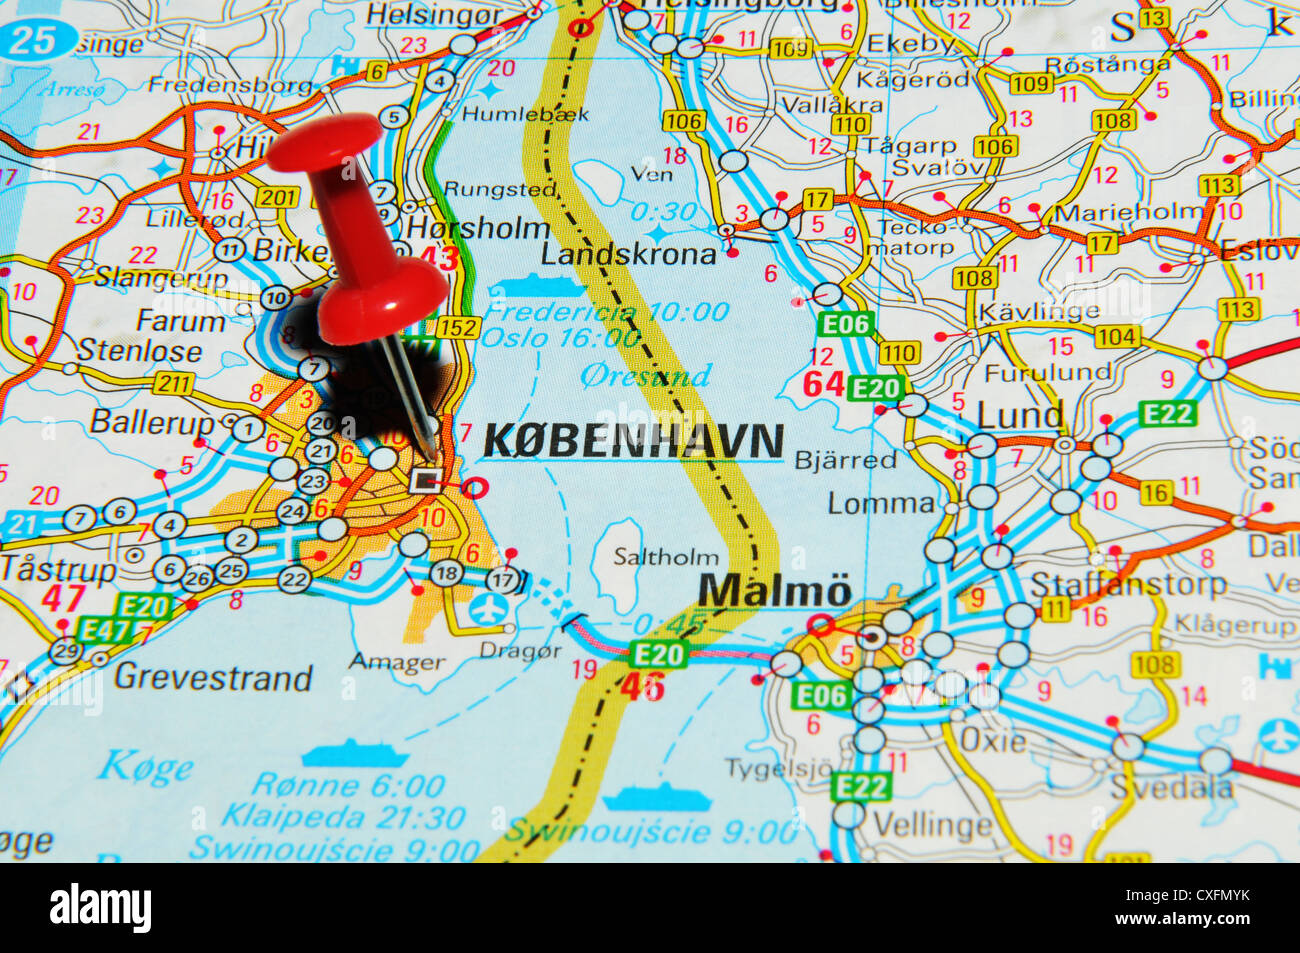 Copenhagen on map - Stock Image